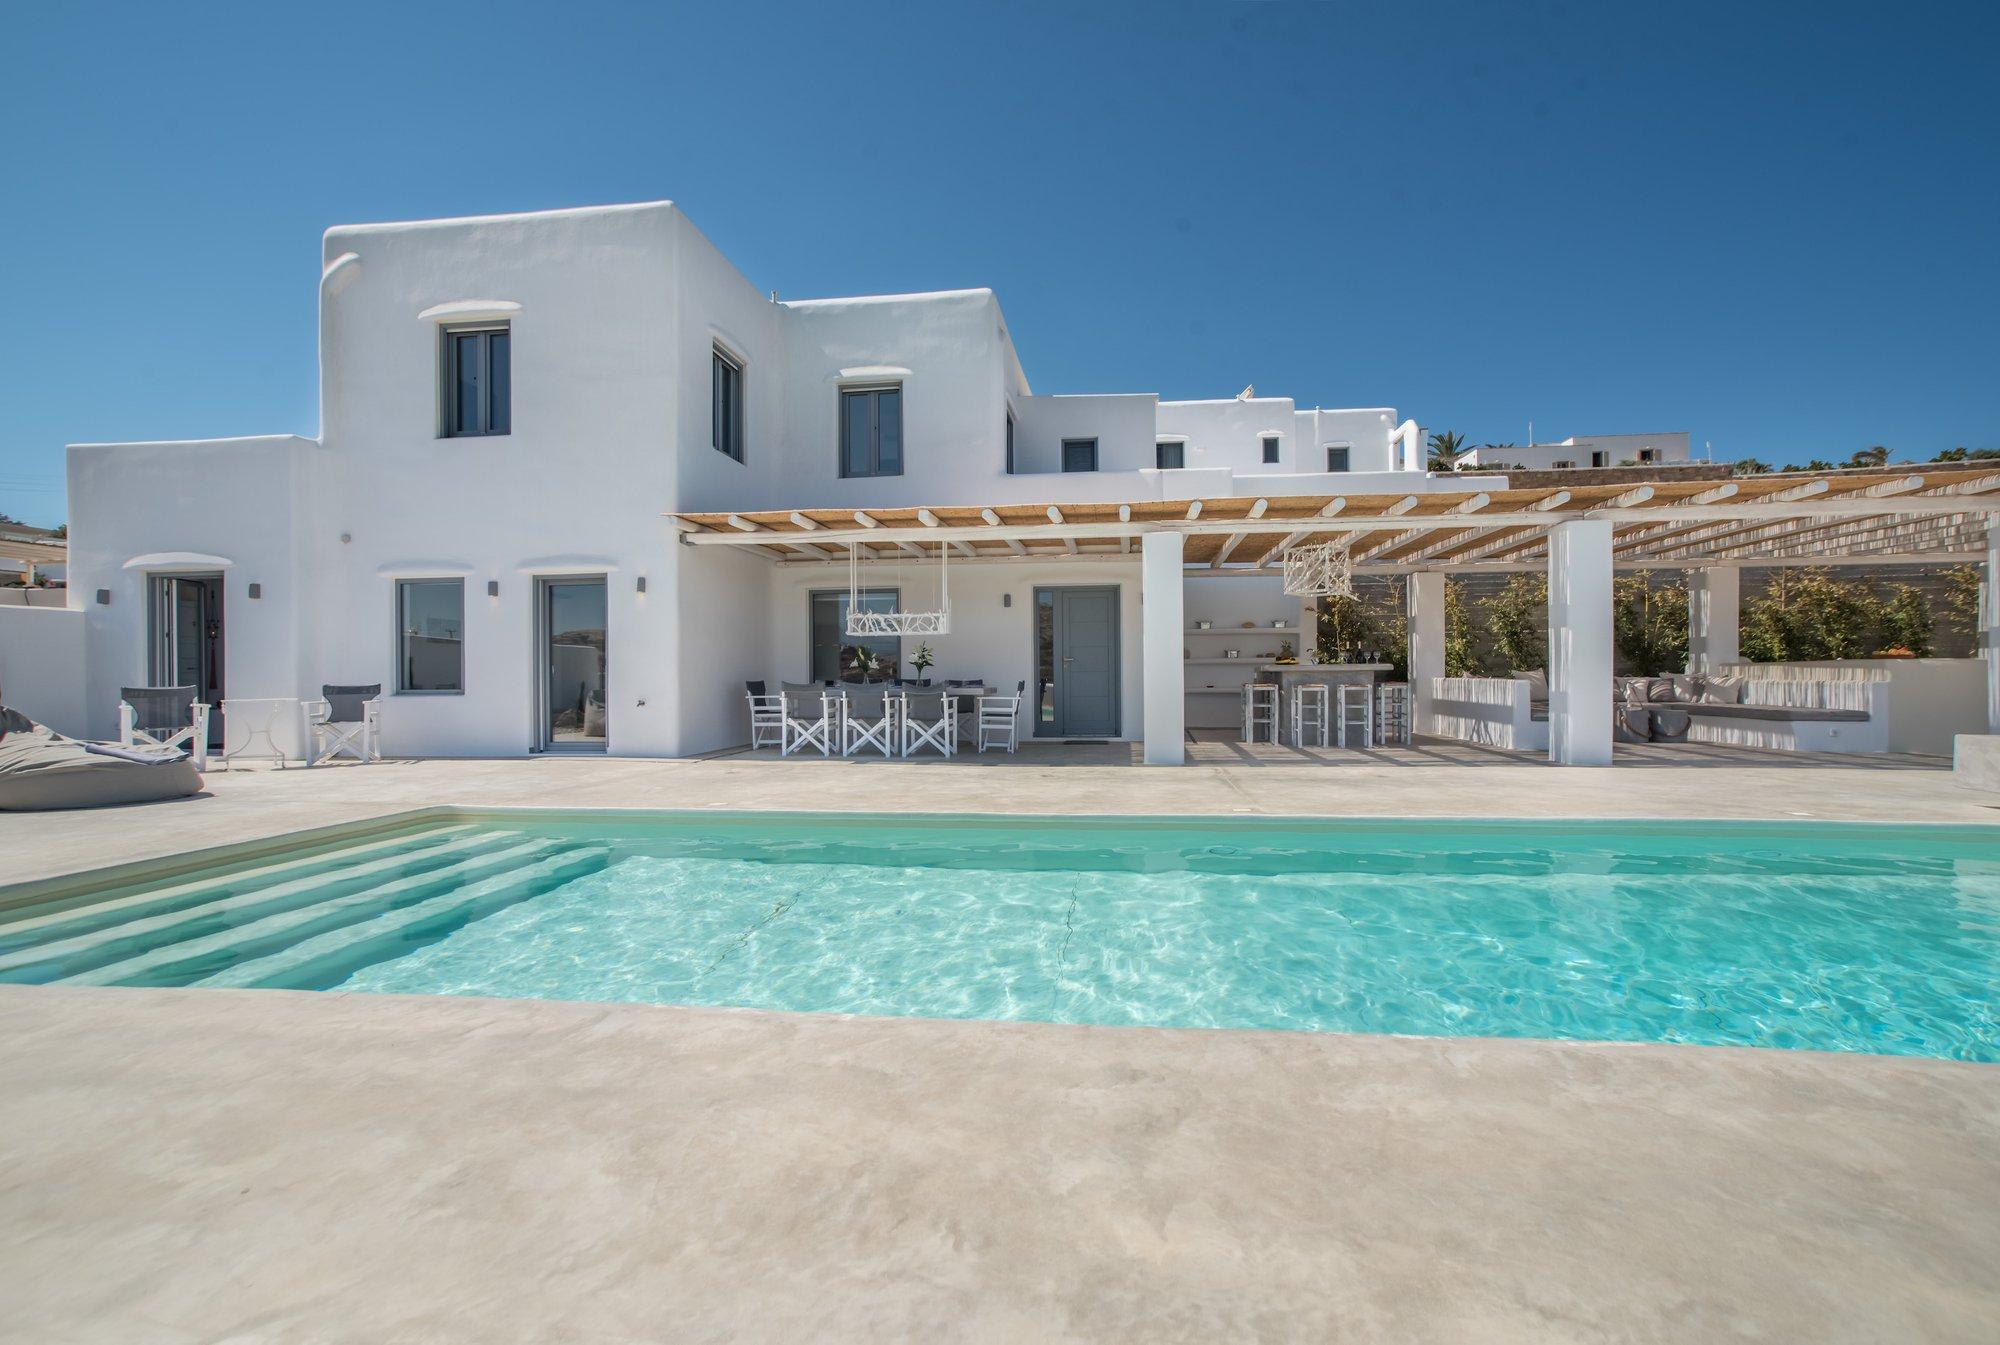 House in Stelida, Greece 1